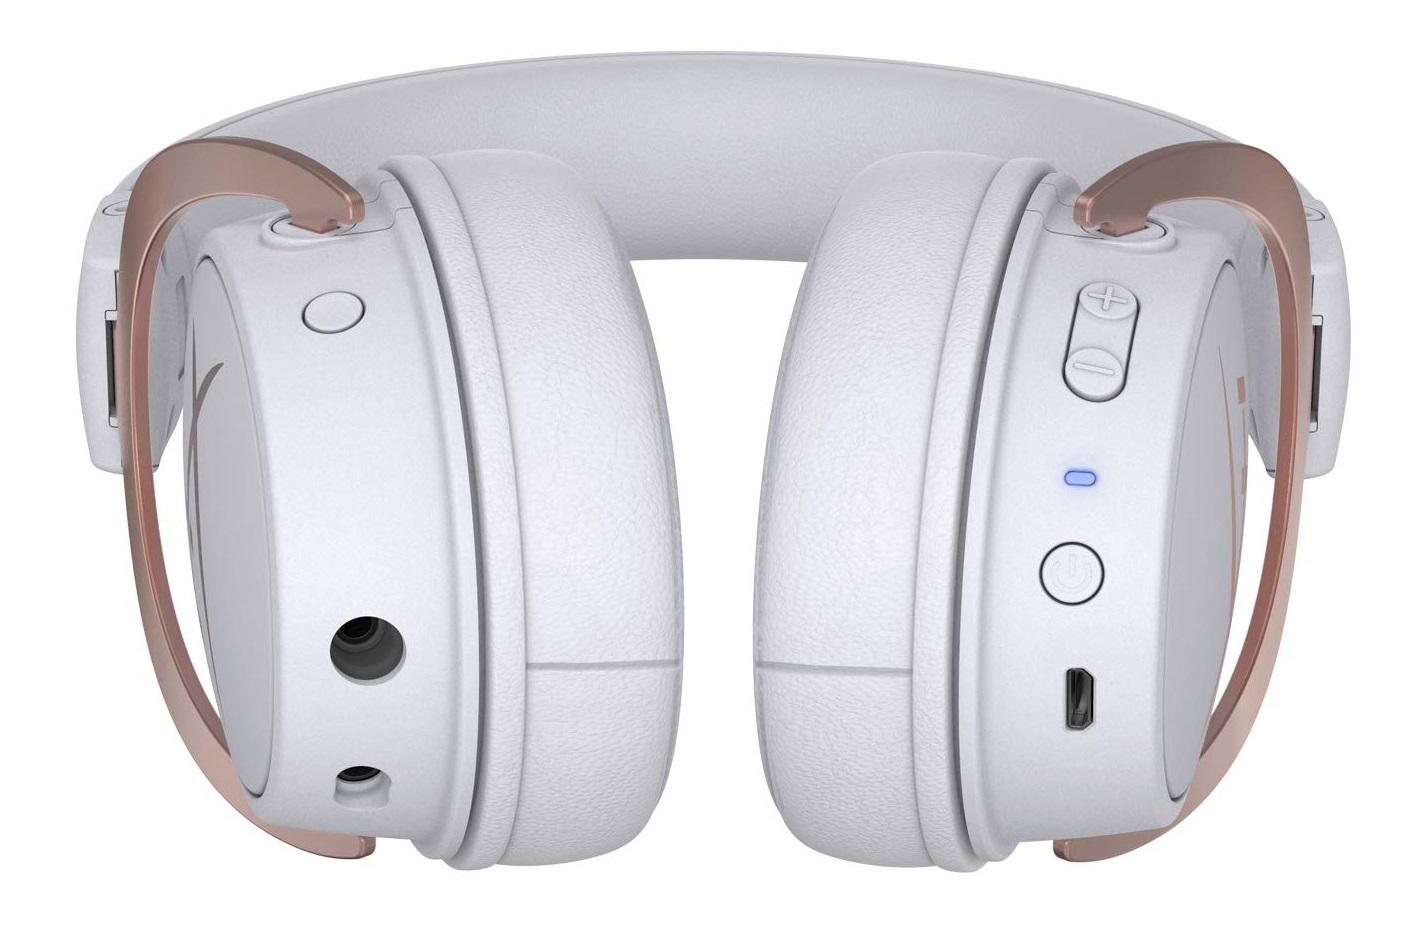 HyperX 專屬的舒適配戴體驗